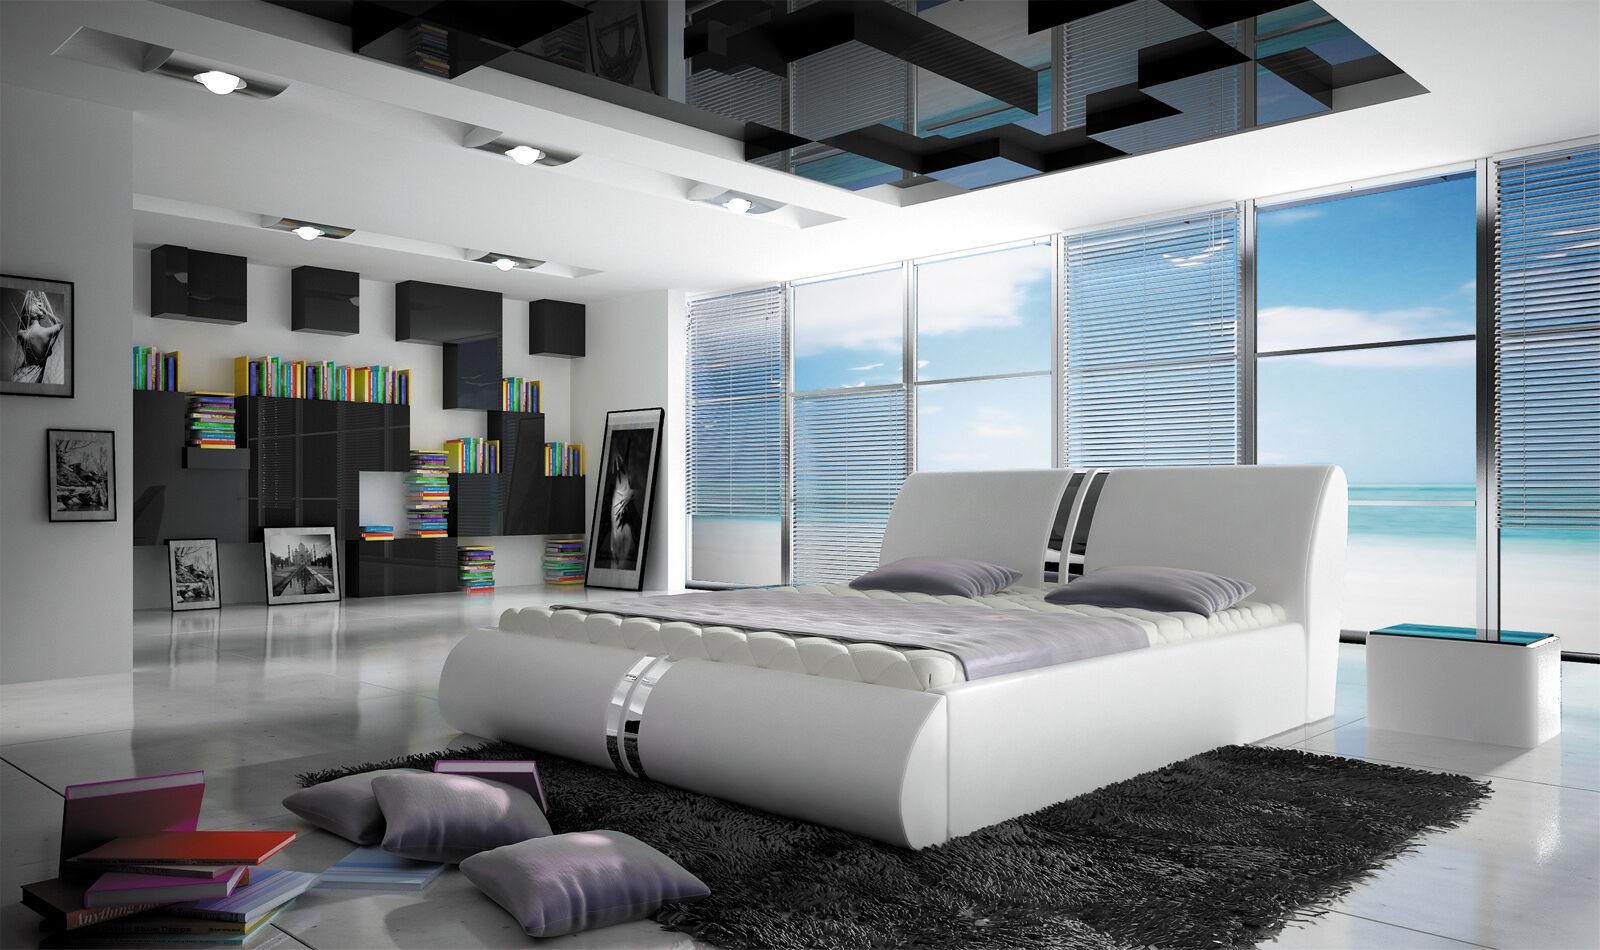 Polsterbett CALISTO Doppelbett Design Bettgestell Bettrahmen mit ...